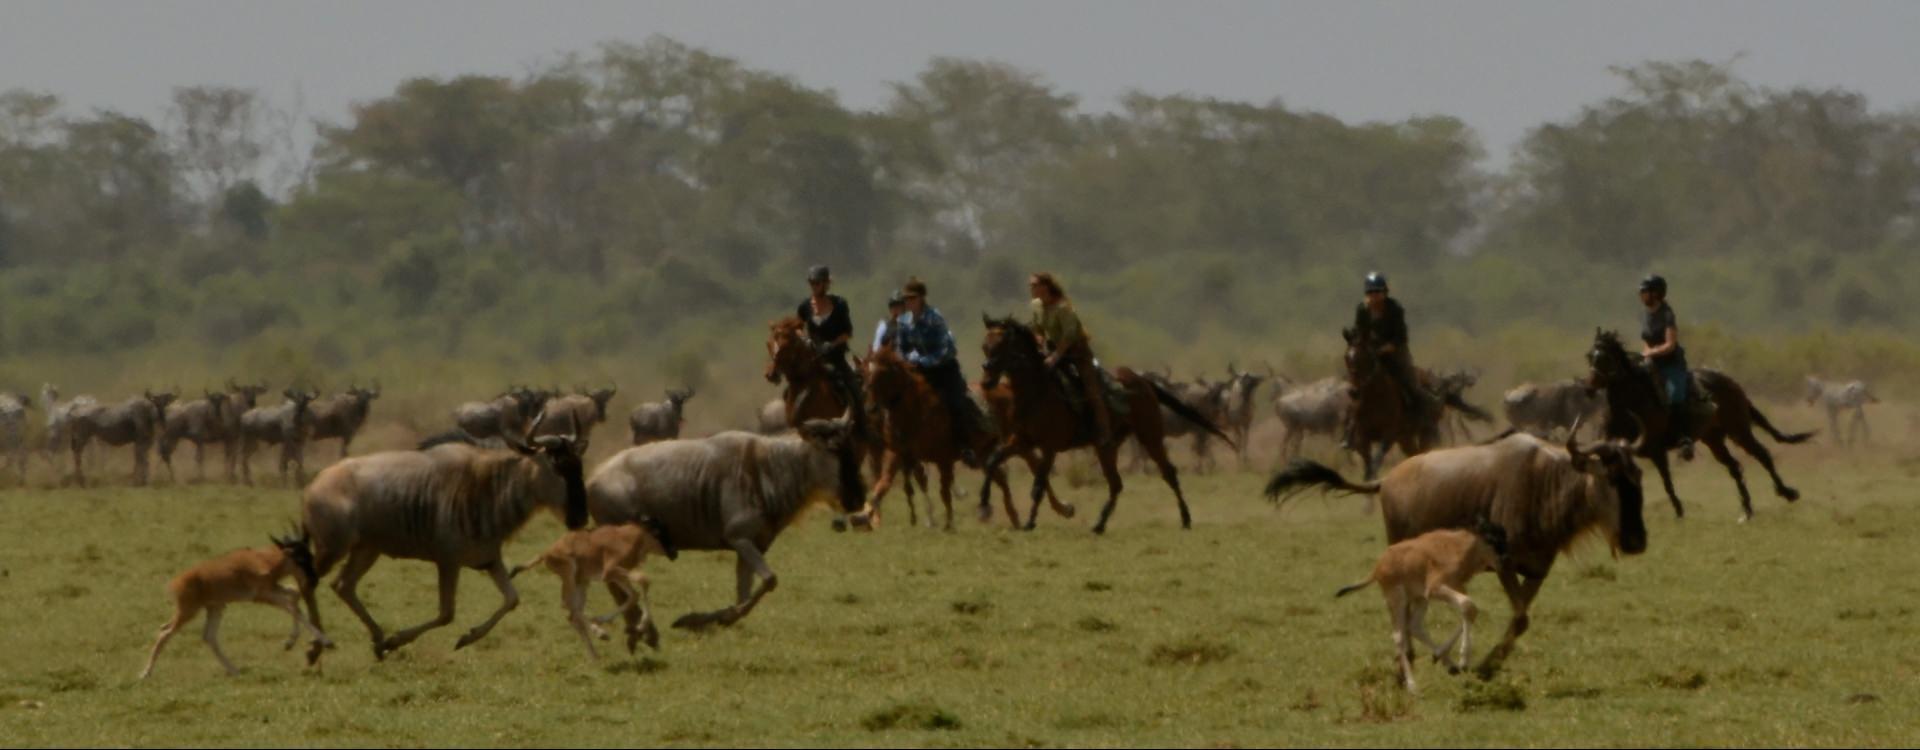 Horseback safari in the Serengeti